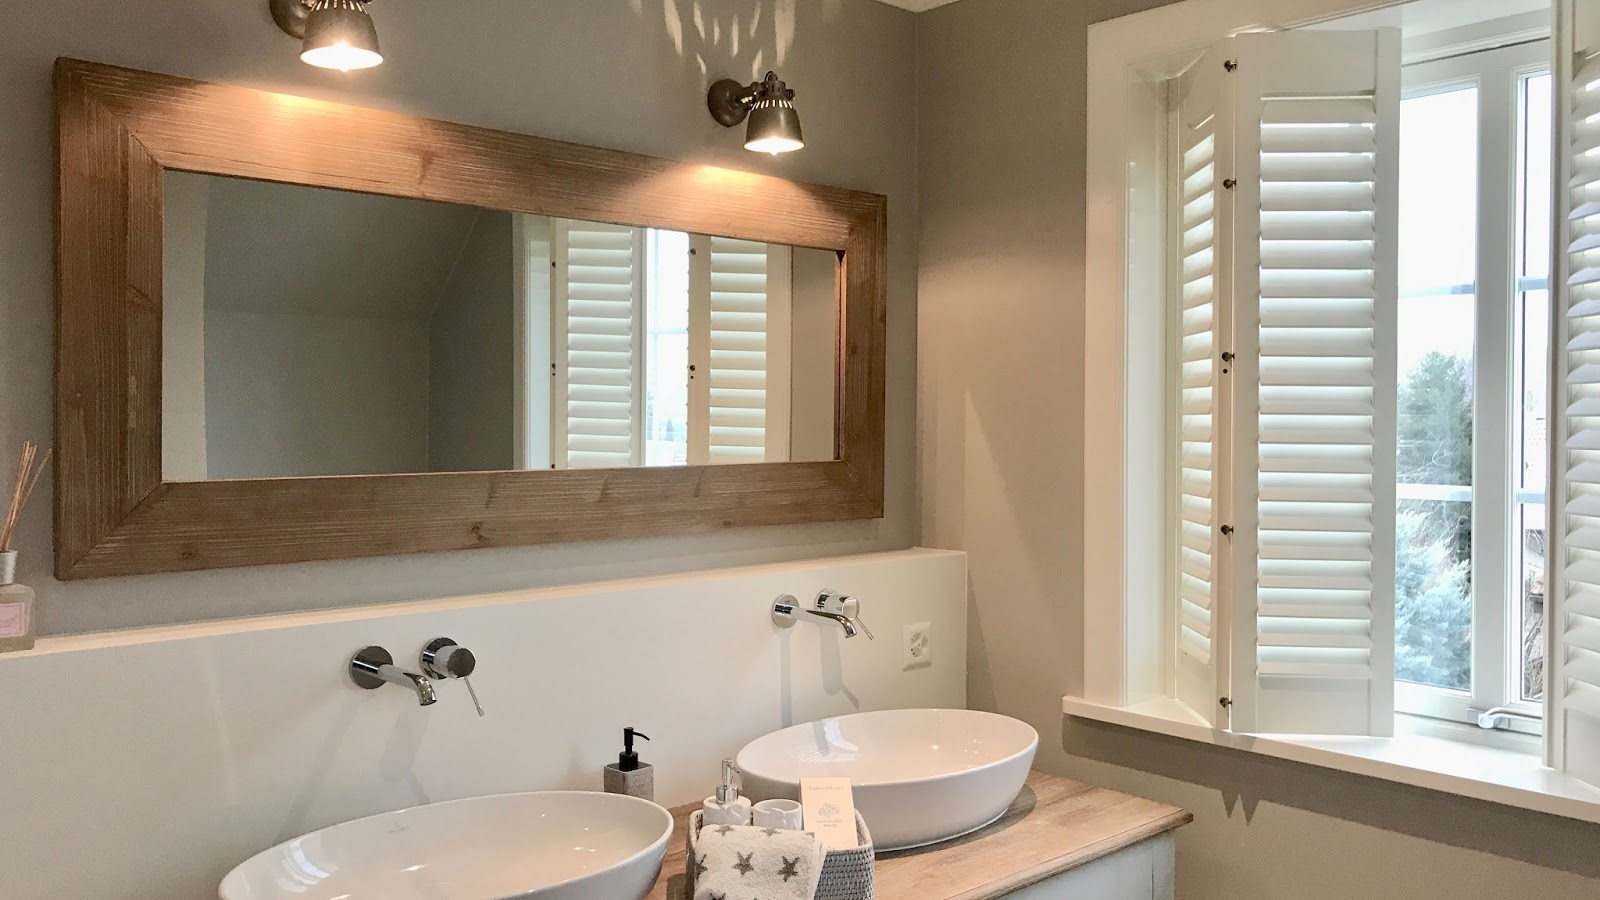 Shutters als Sichtschutz im Badezimmer - Beachhouse Living